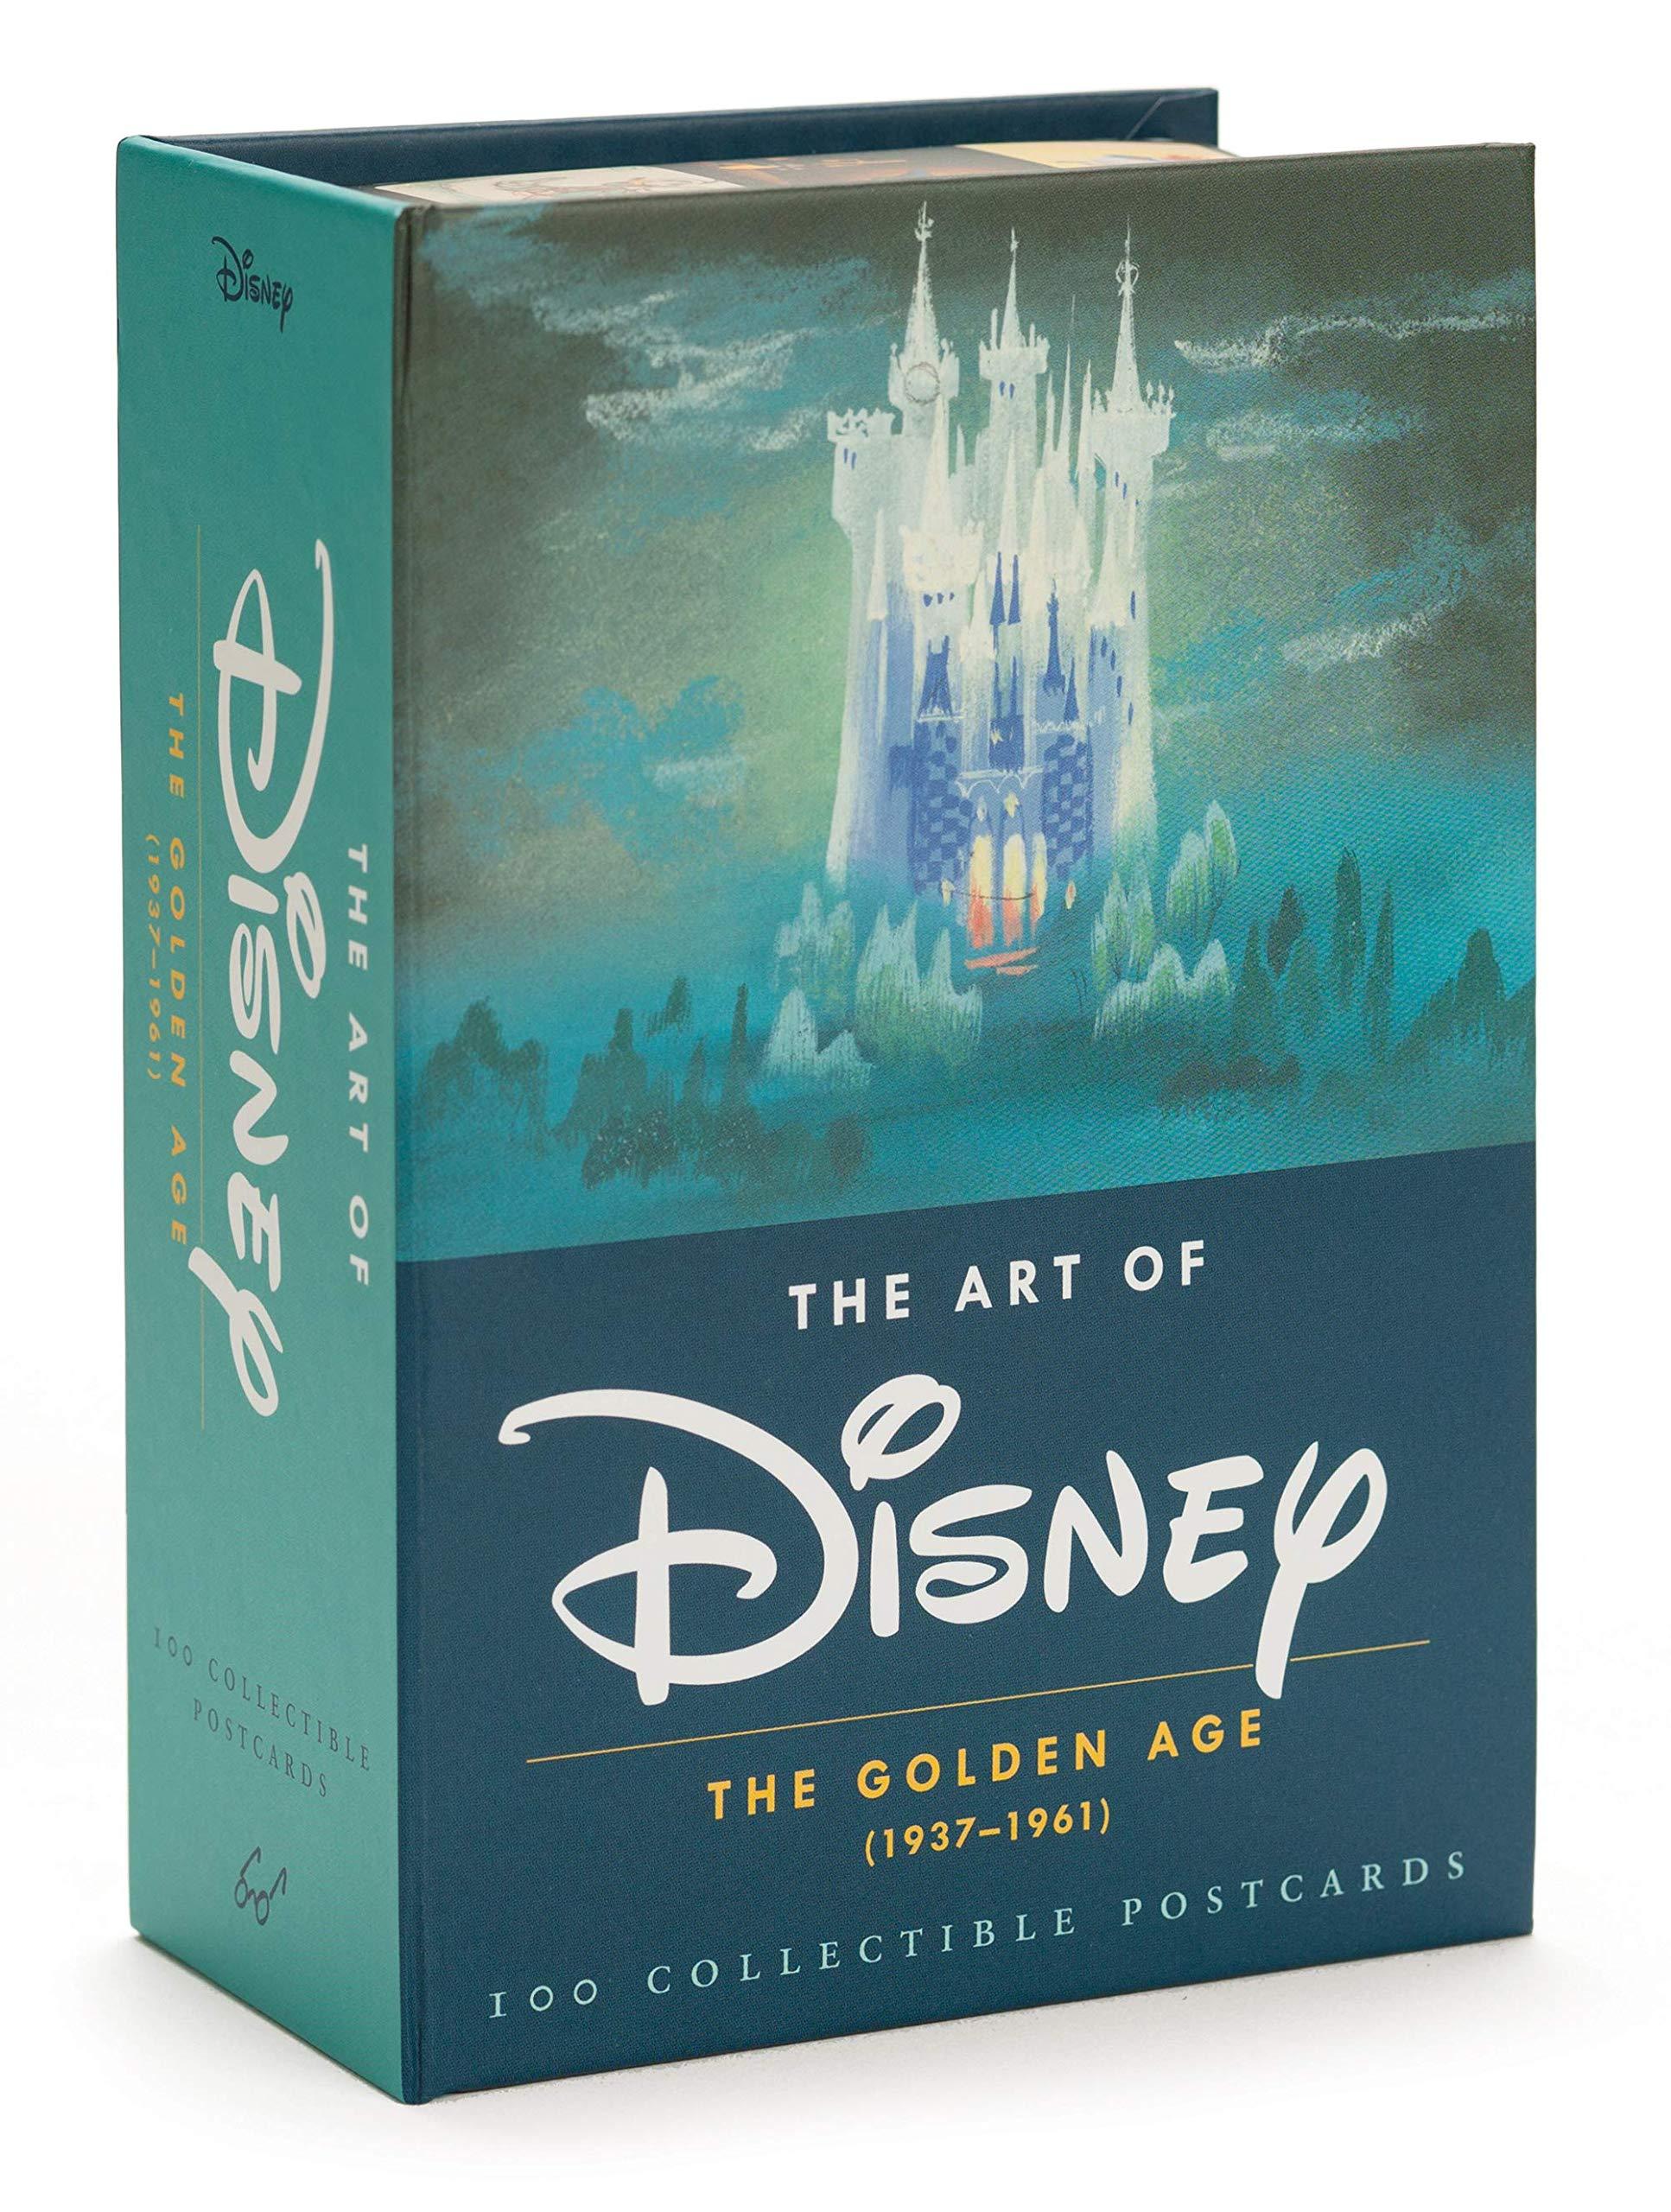 Coffret Box Collector Disney Postcards 1937-1961 : 100 Cartes Postale Exclusive